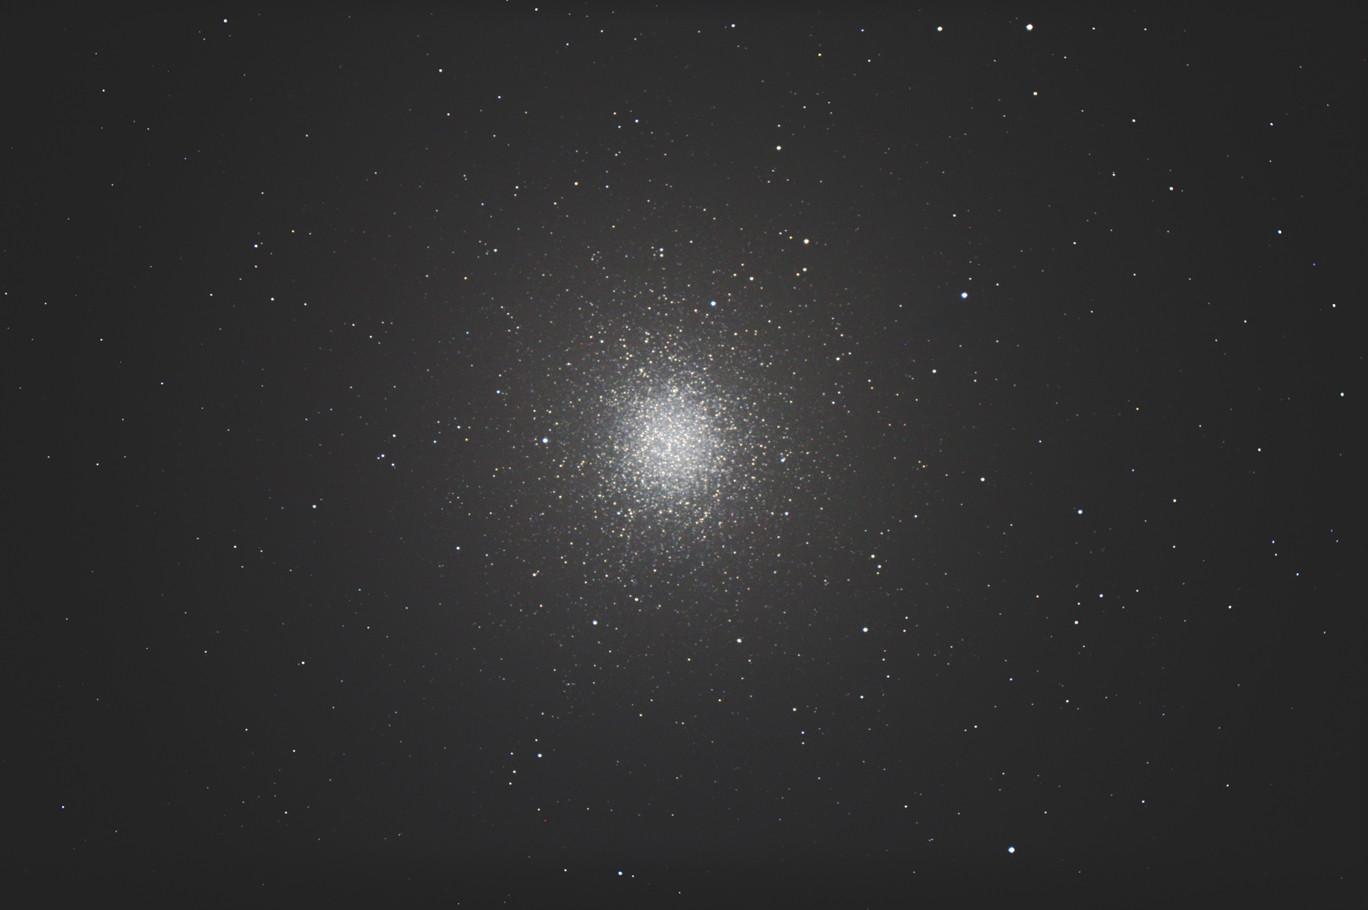 NGC5139 from PTC last night